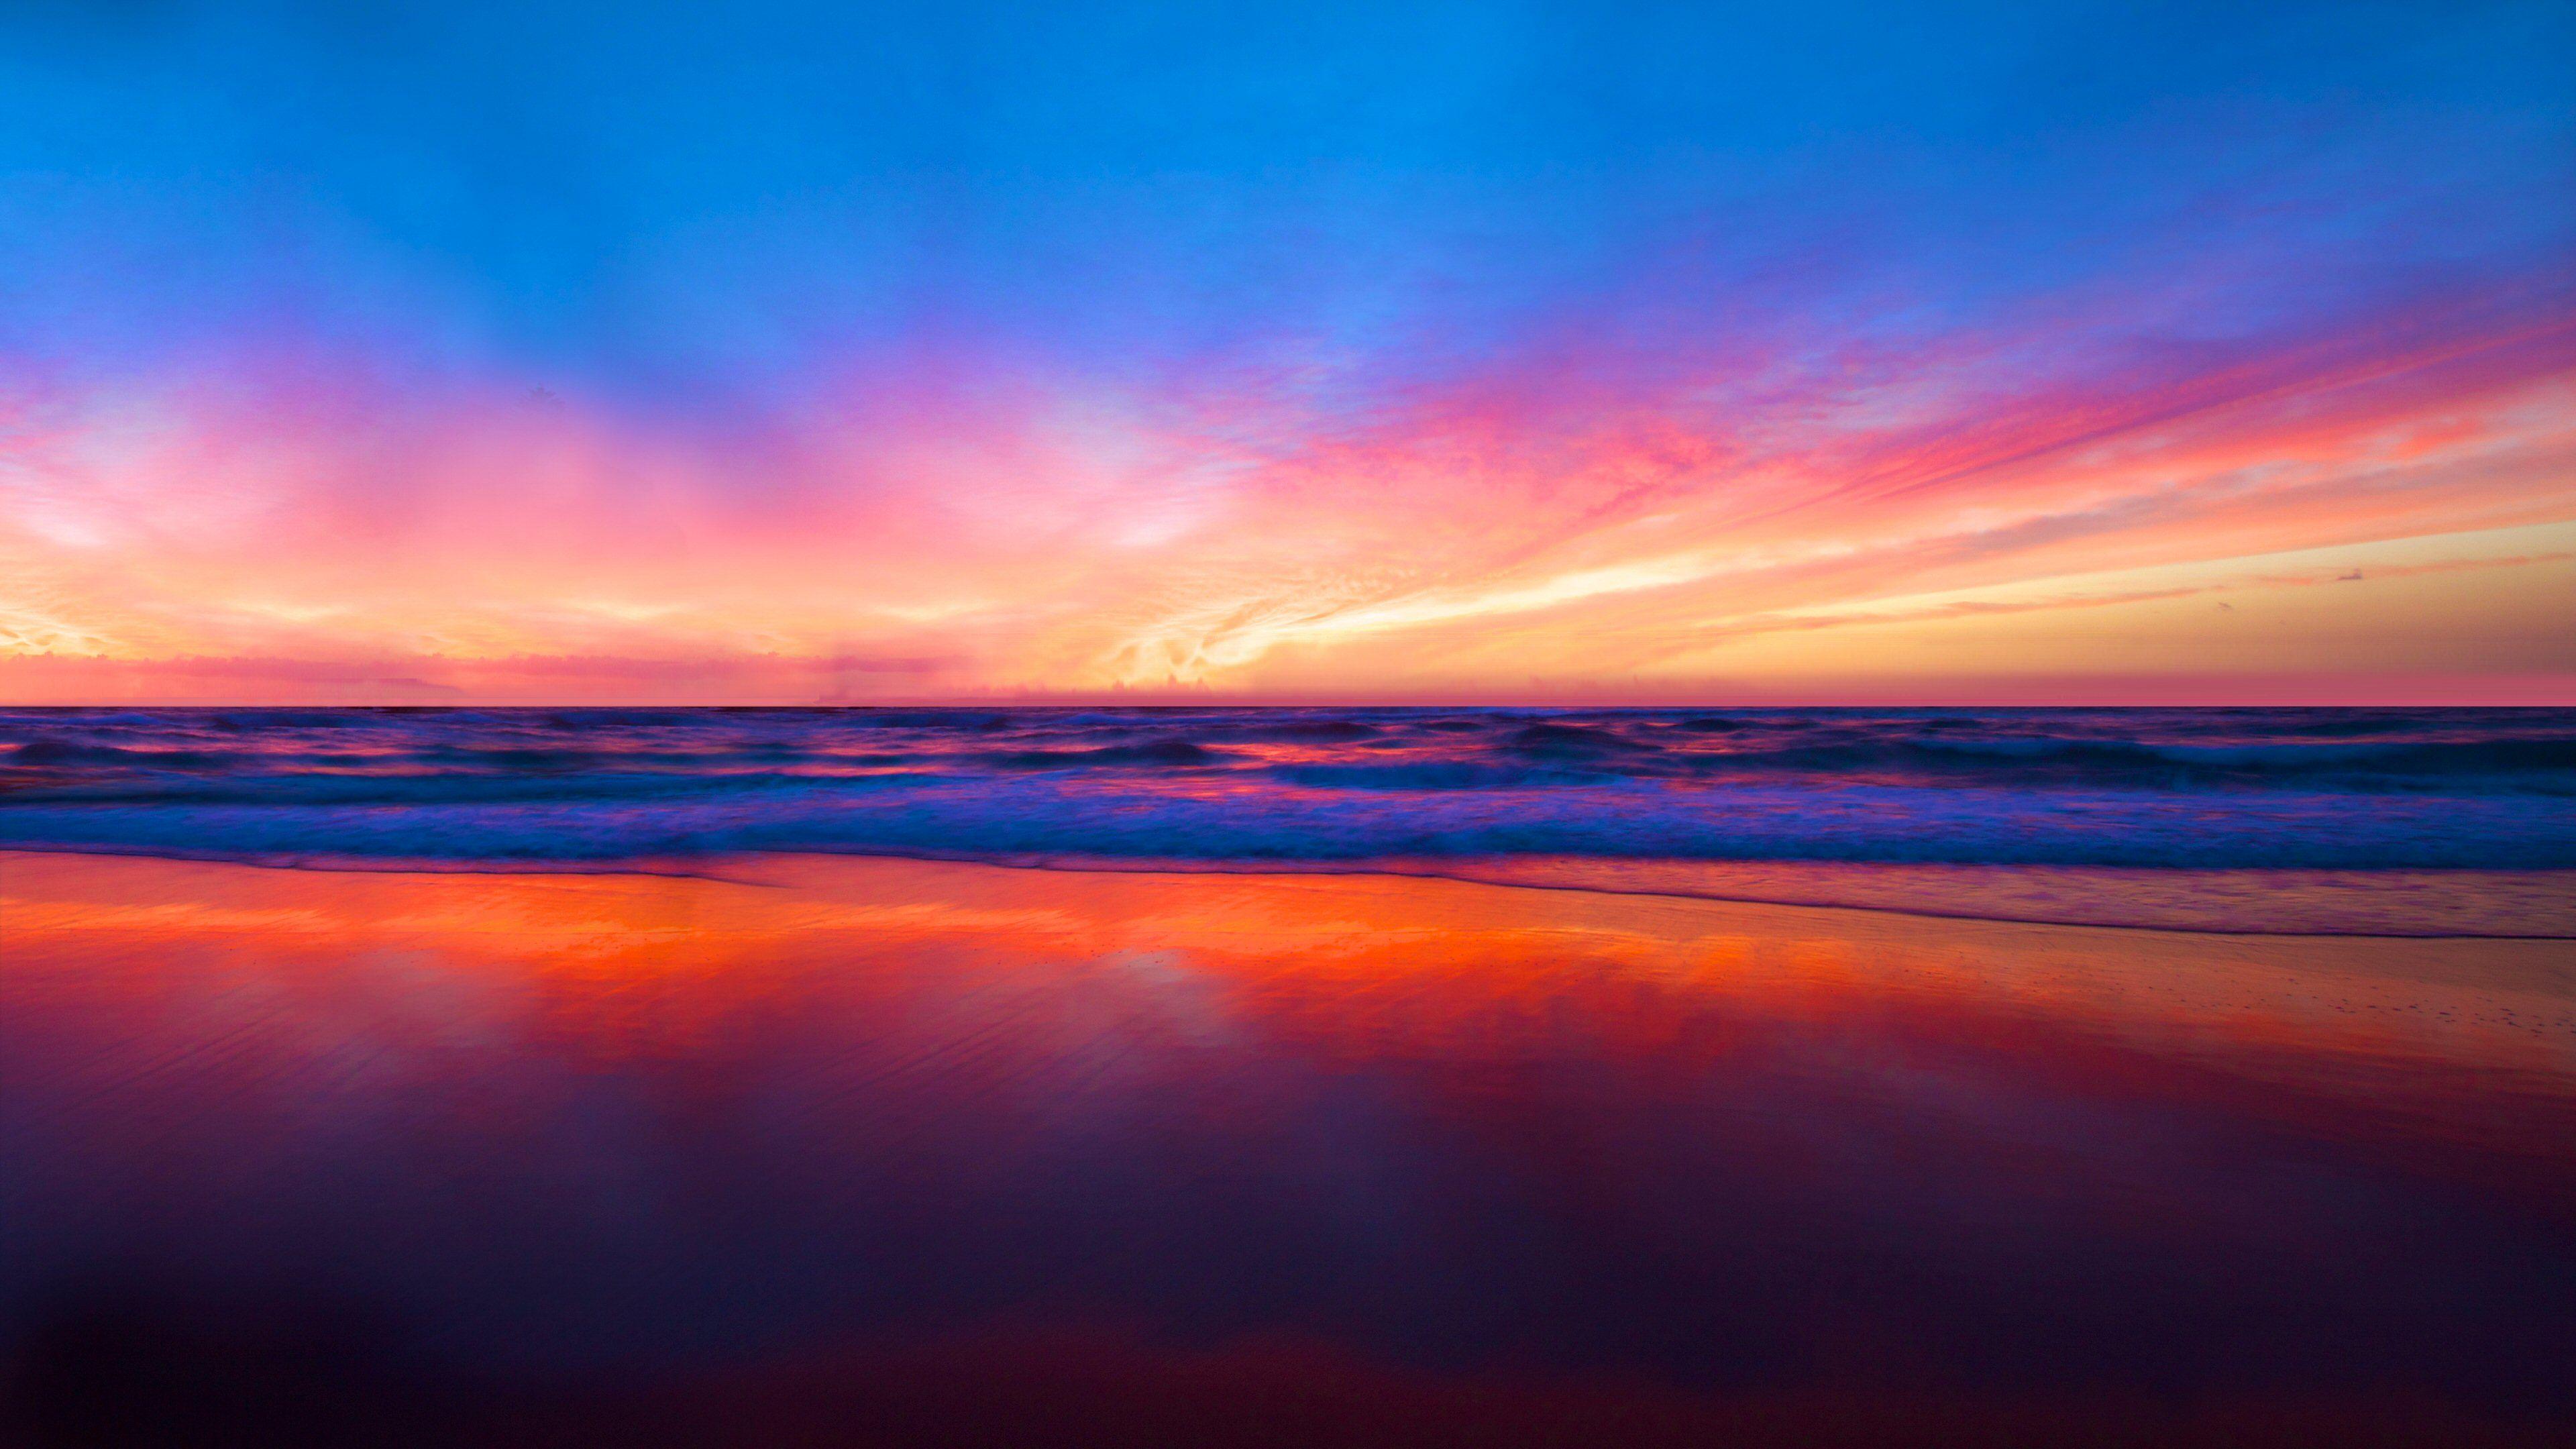 Download Wallpaper 3840x2400 Sea Sunset Clouds Night Shore 4k Ultra Hd 16 10 Hd Background Hd Wallpaper Sunset Wallpaper